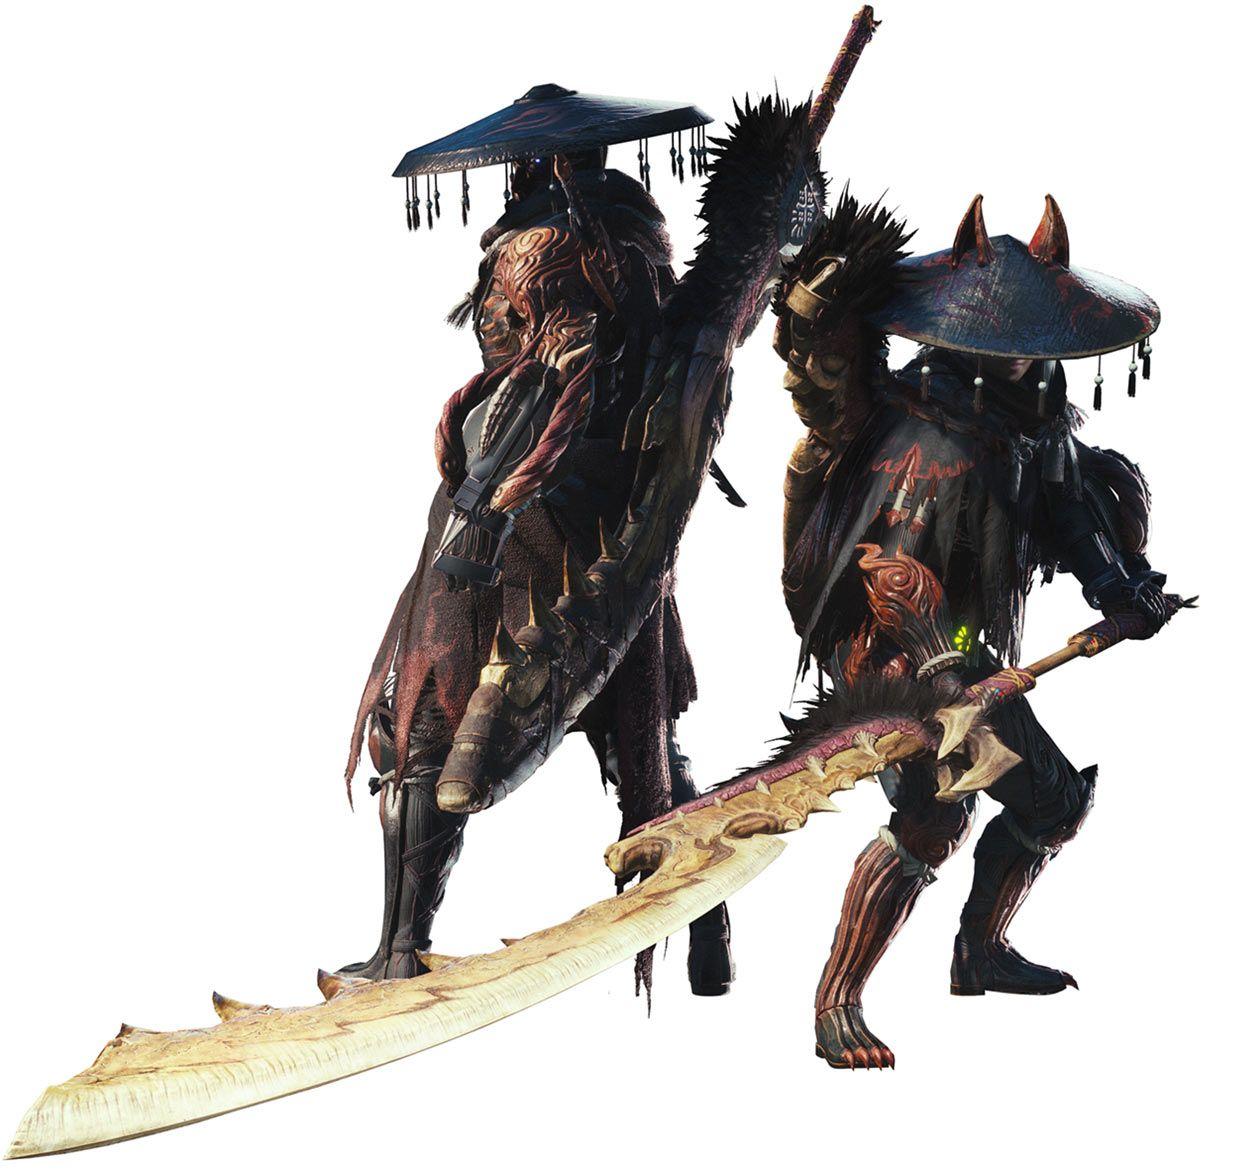 longsword The Best Solo A-Tier Weapons